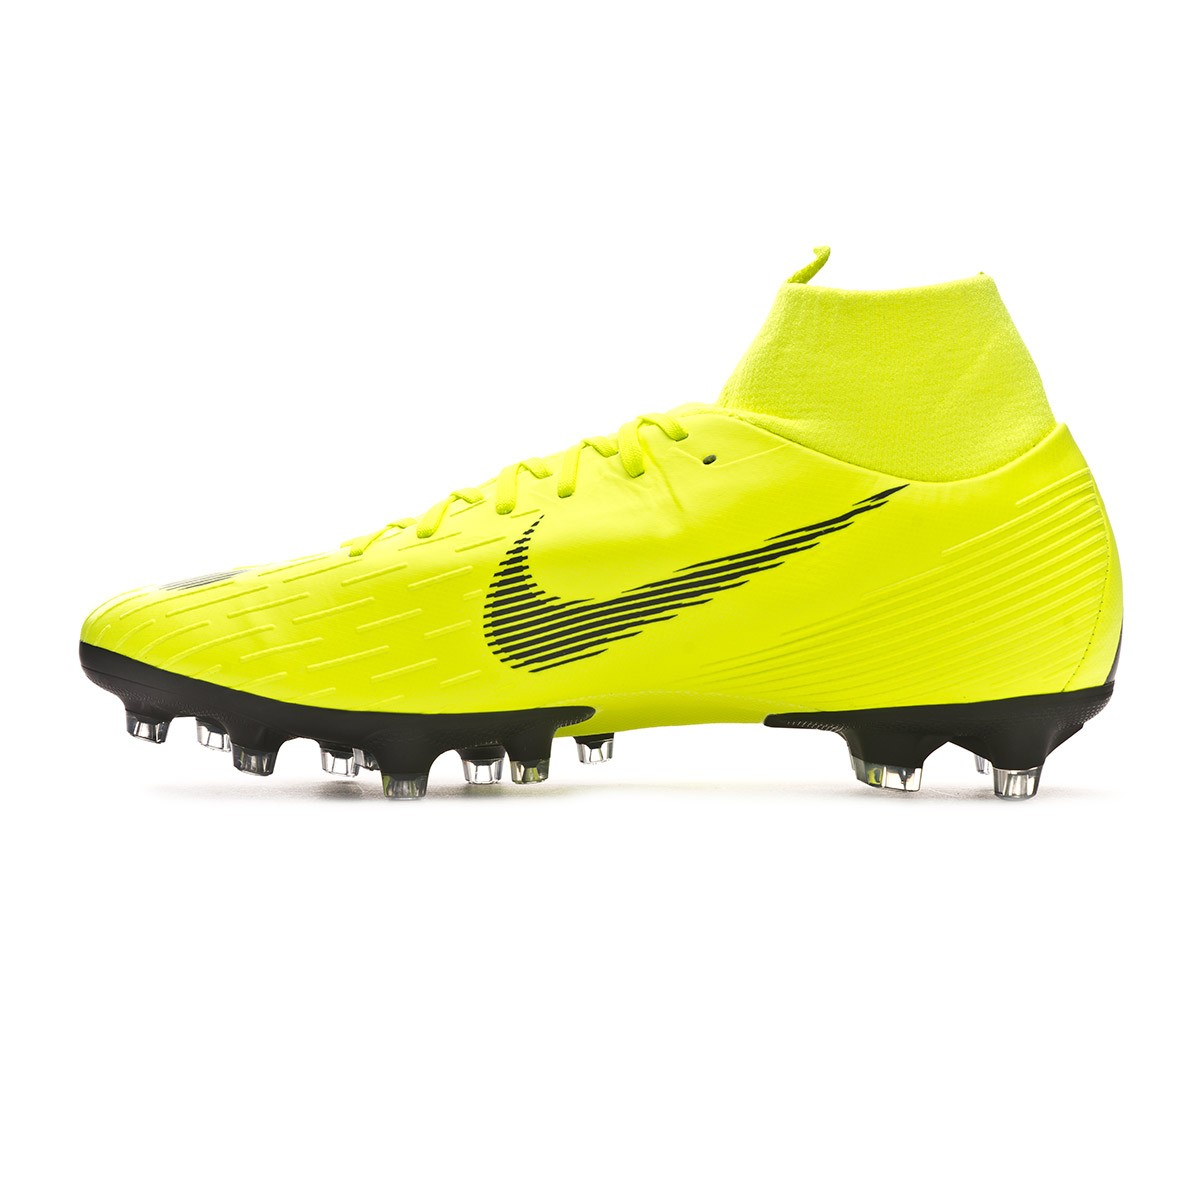 b885cad0cce Football Boots Nike Mercurial Superfly VI Pro AG-Pro Volt-Black - Tienda de  fútbol Fútbol Emotion